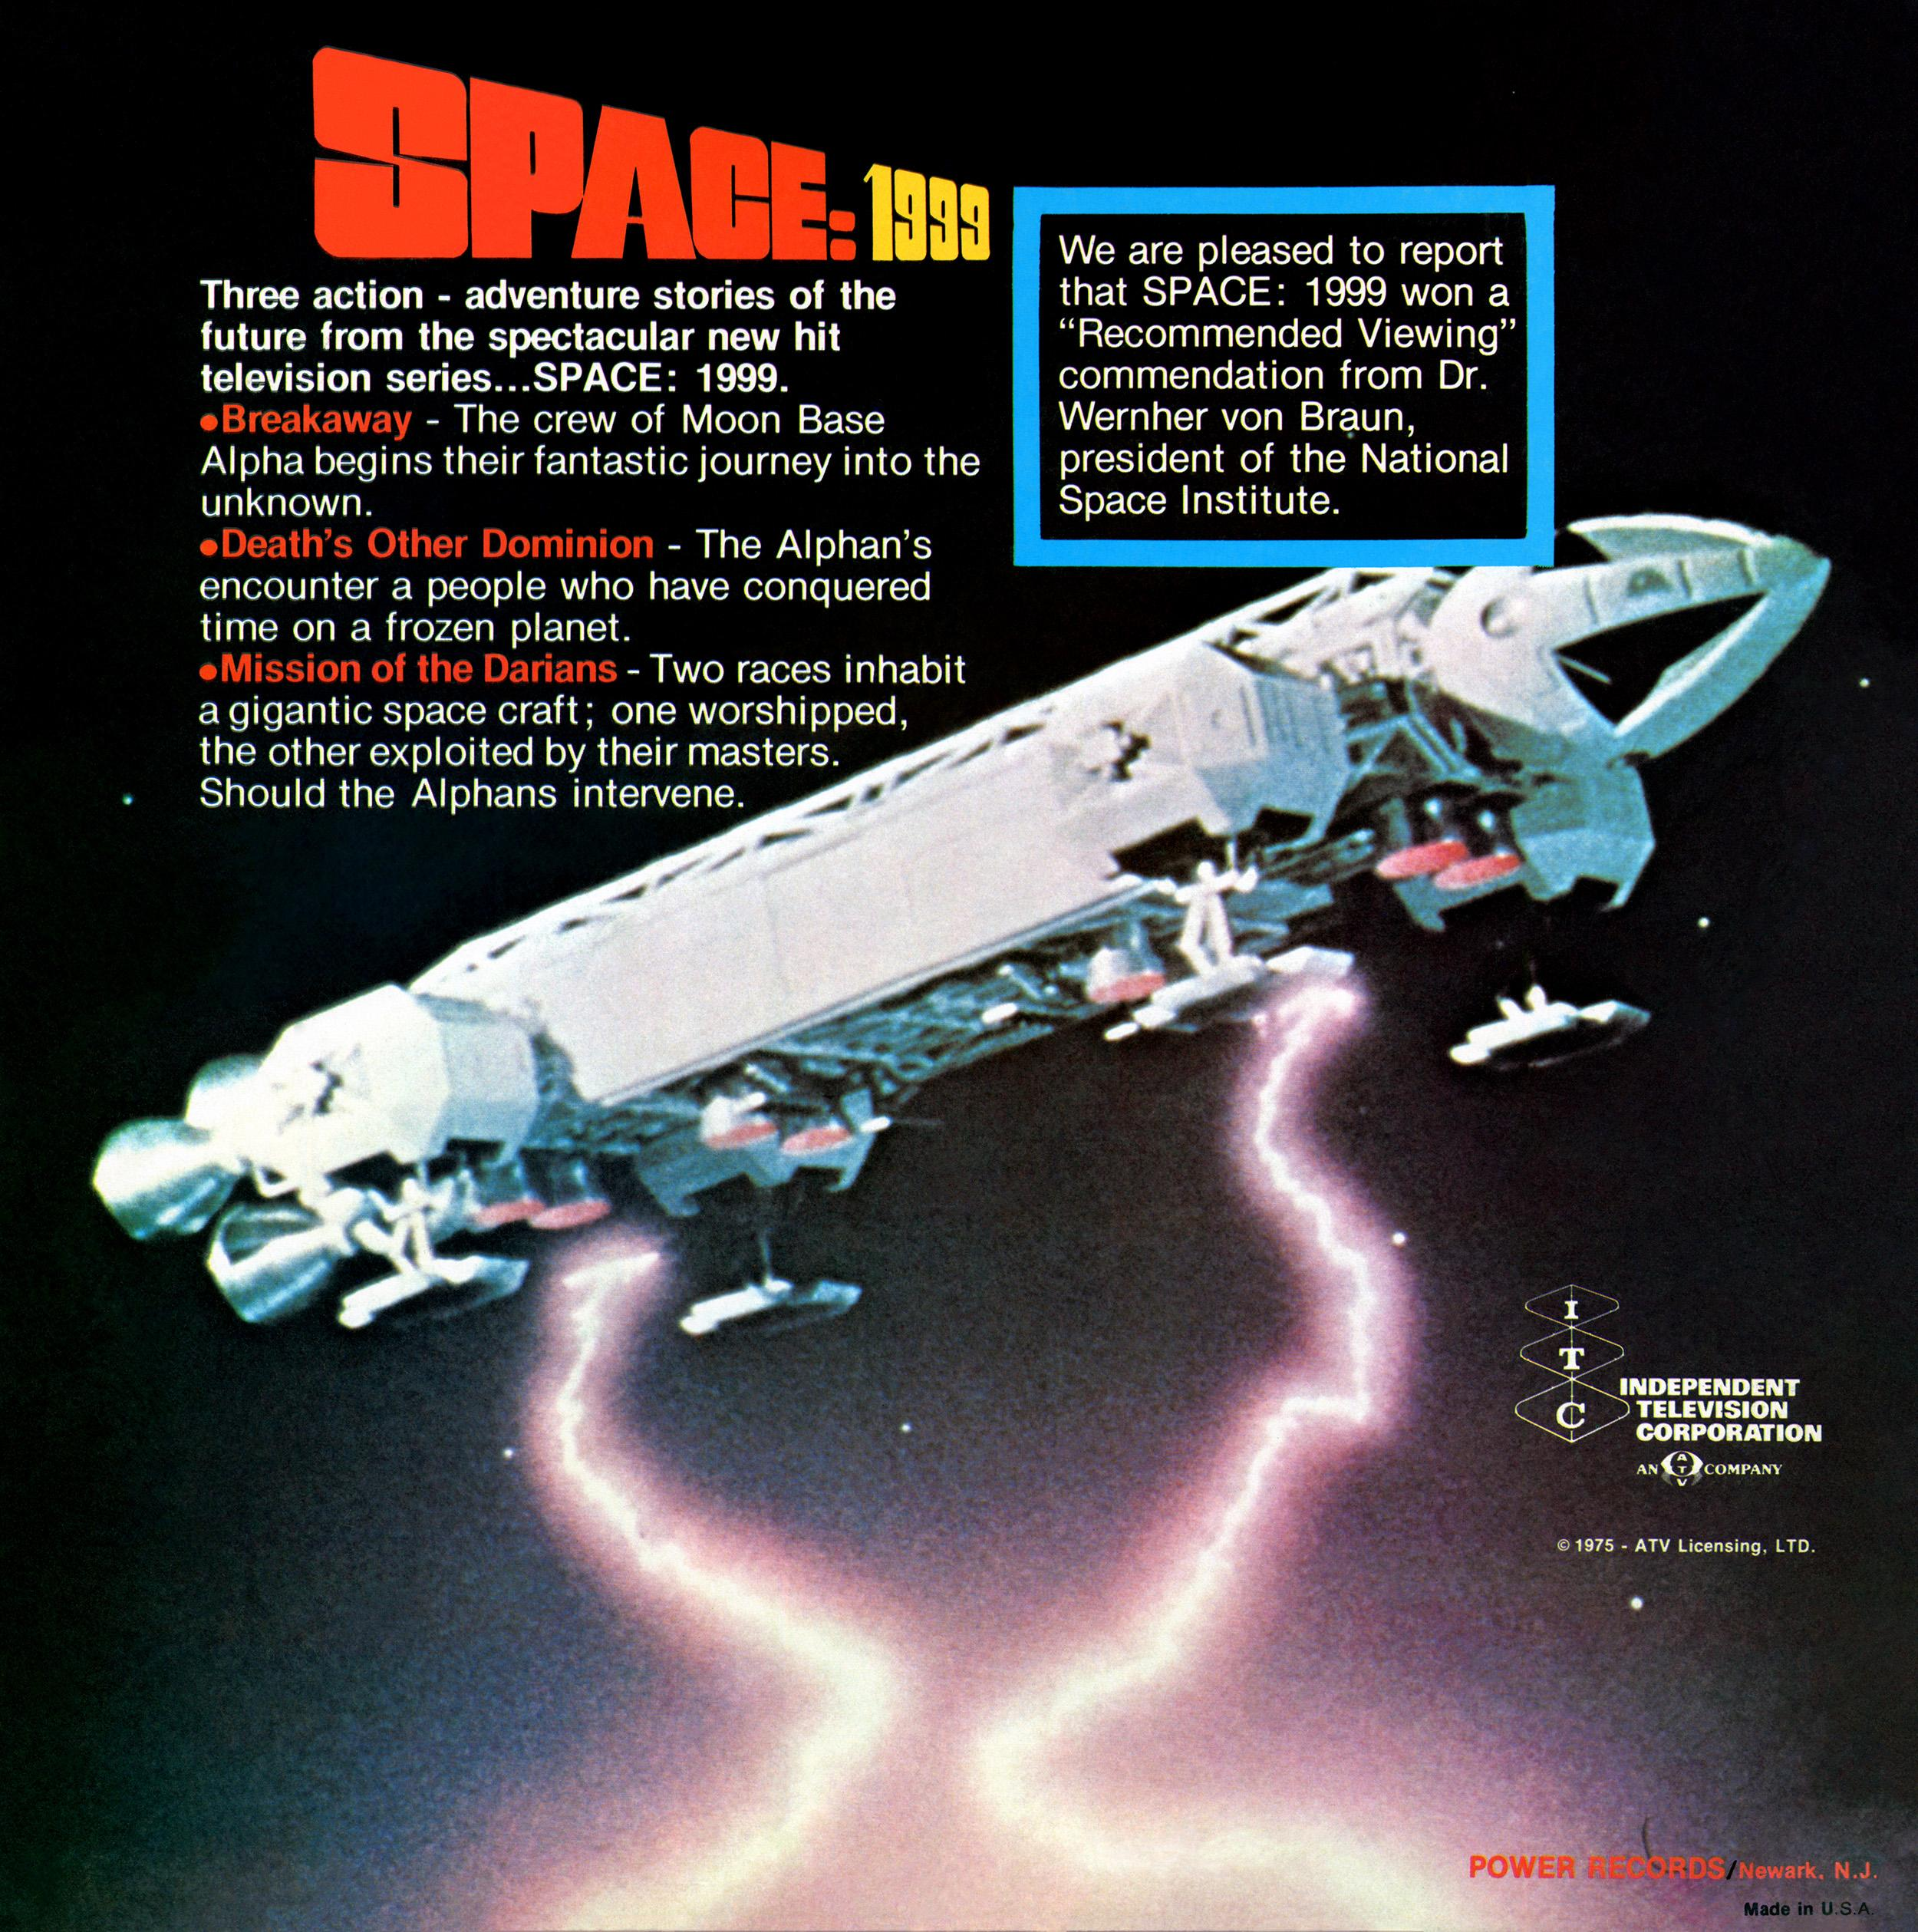 Space 1999 Merchandise Guide: Soundtracks